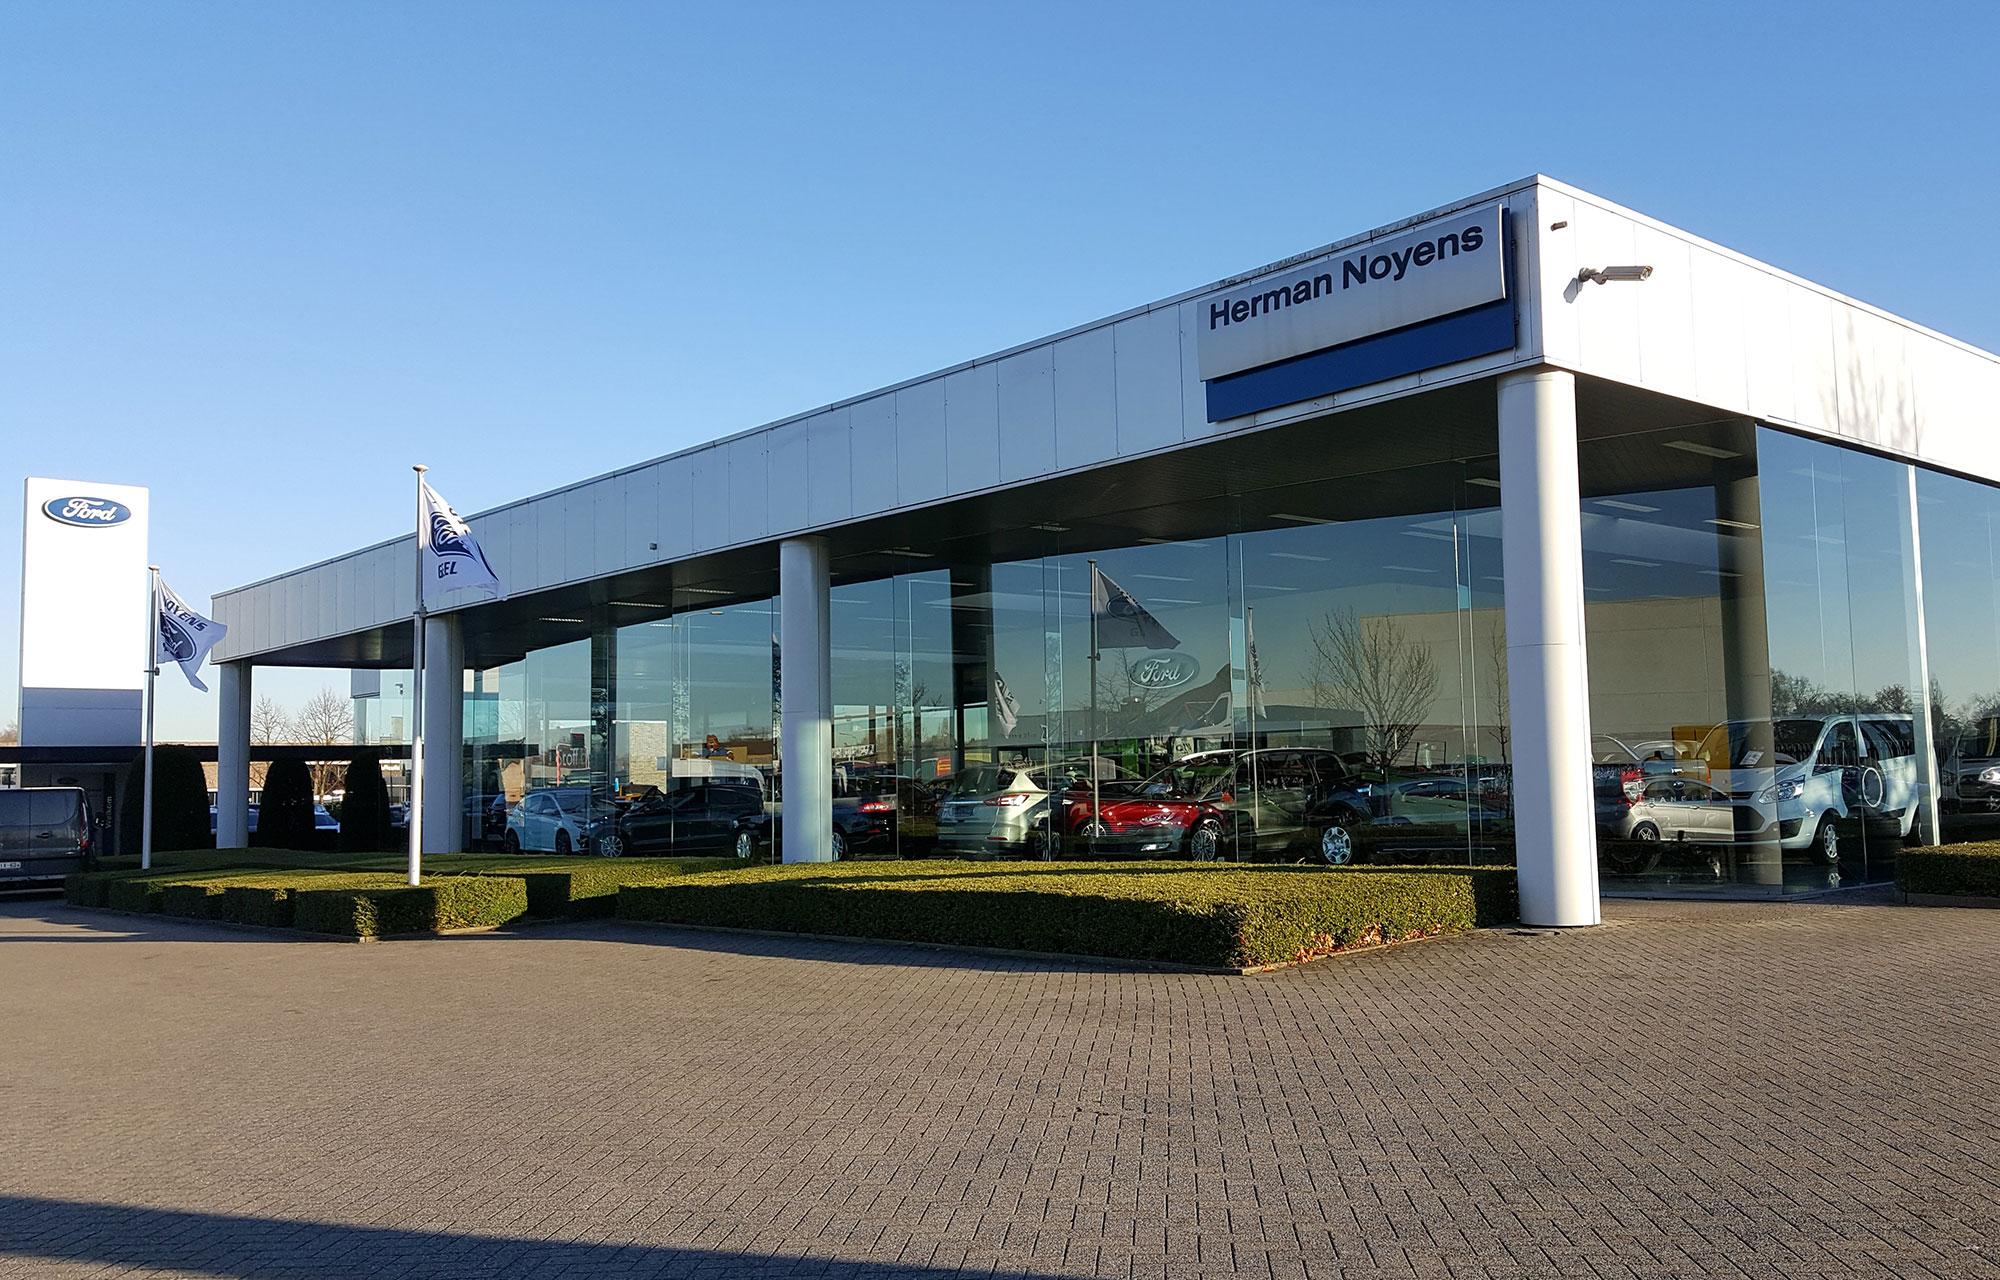 Ford Garage Herman Noyens in Geel